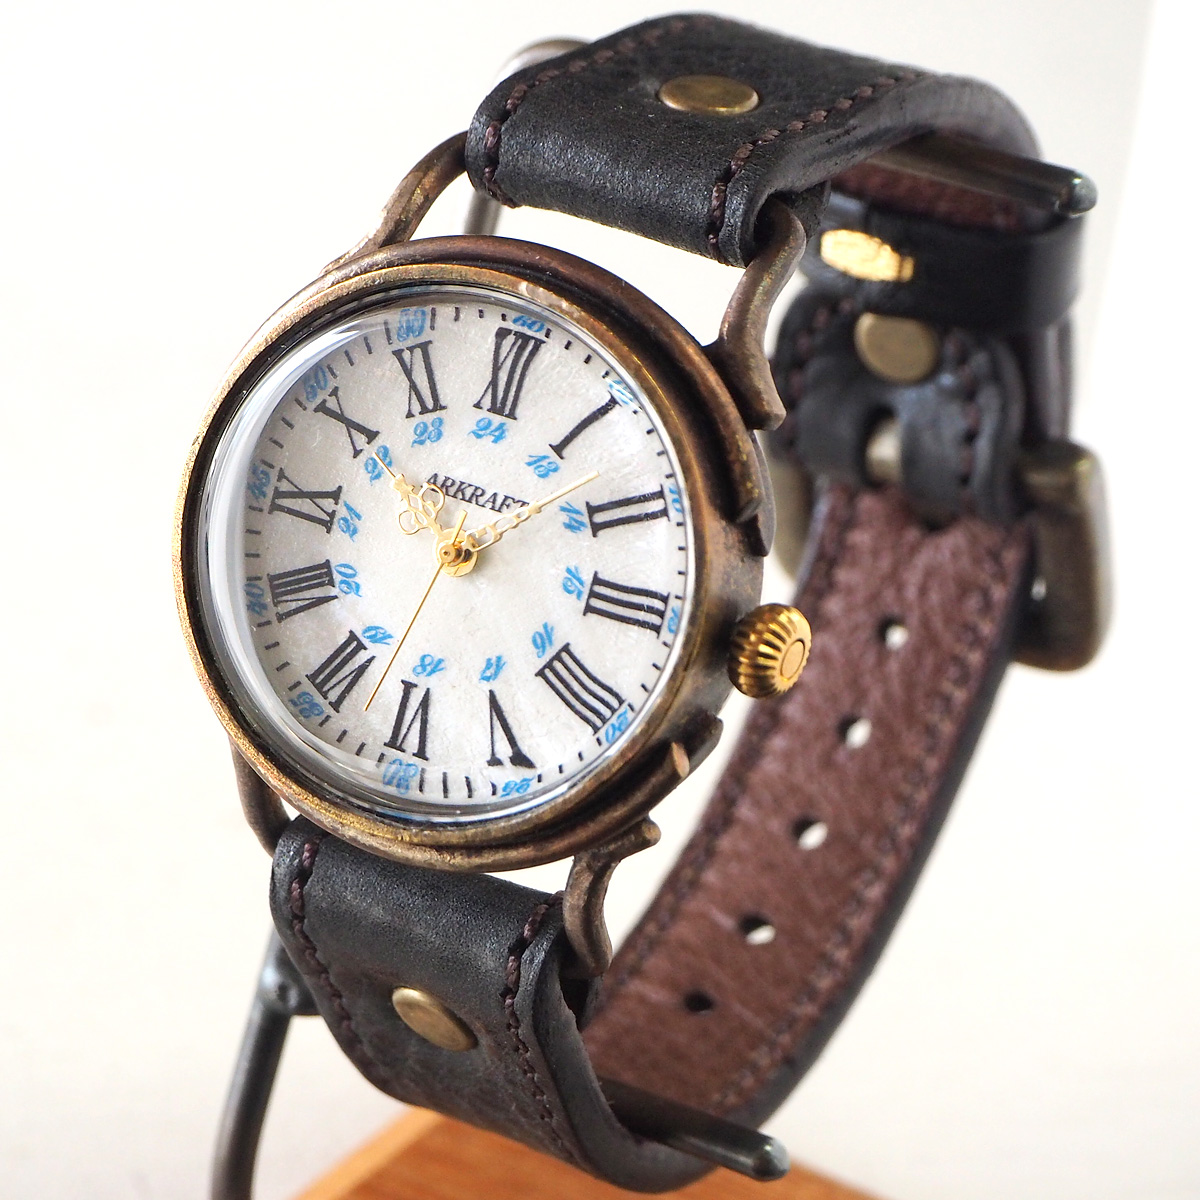 "ARKRAFT(アークラフト) 時計作家・新木秀和 手作り腕時計 ""Drake Large"" ホワイトシェル&ブルードット プレミアムストラップ [AR-C-019-WH-BL]"